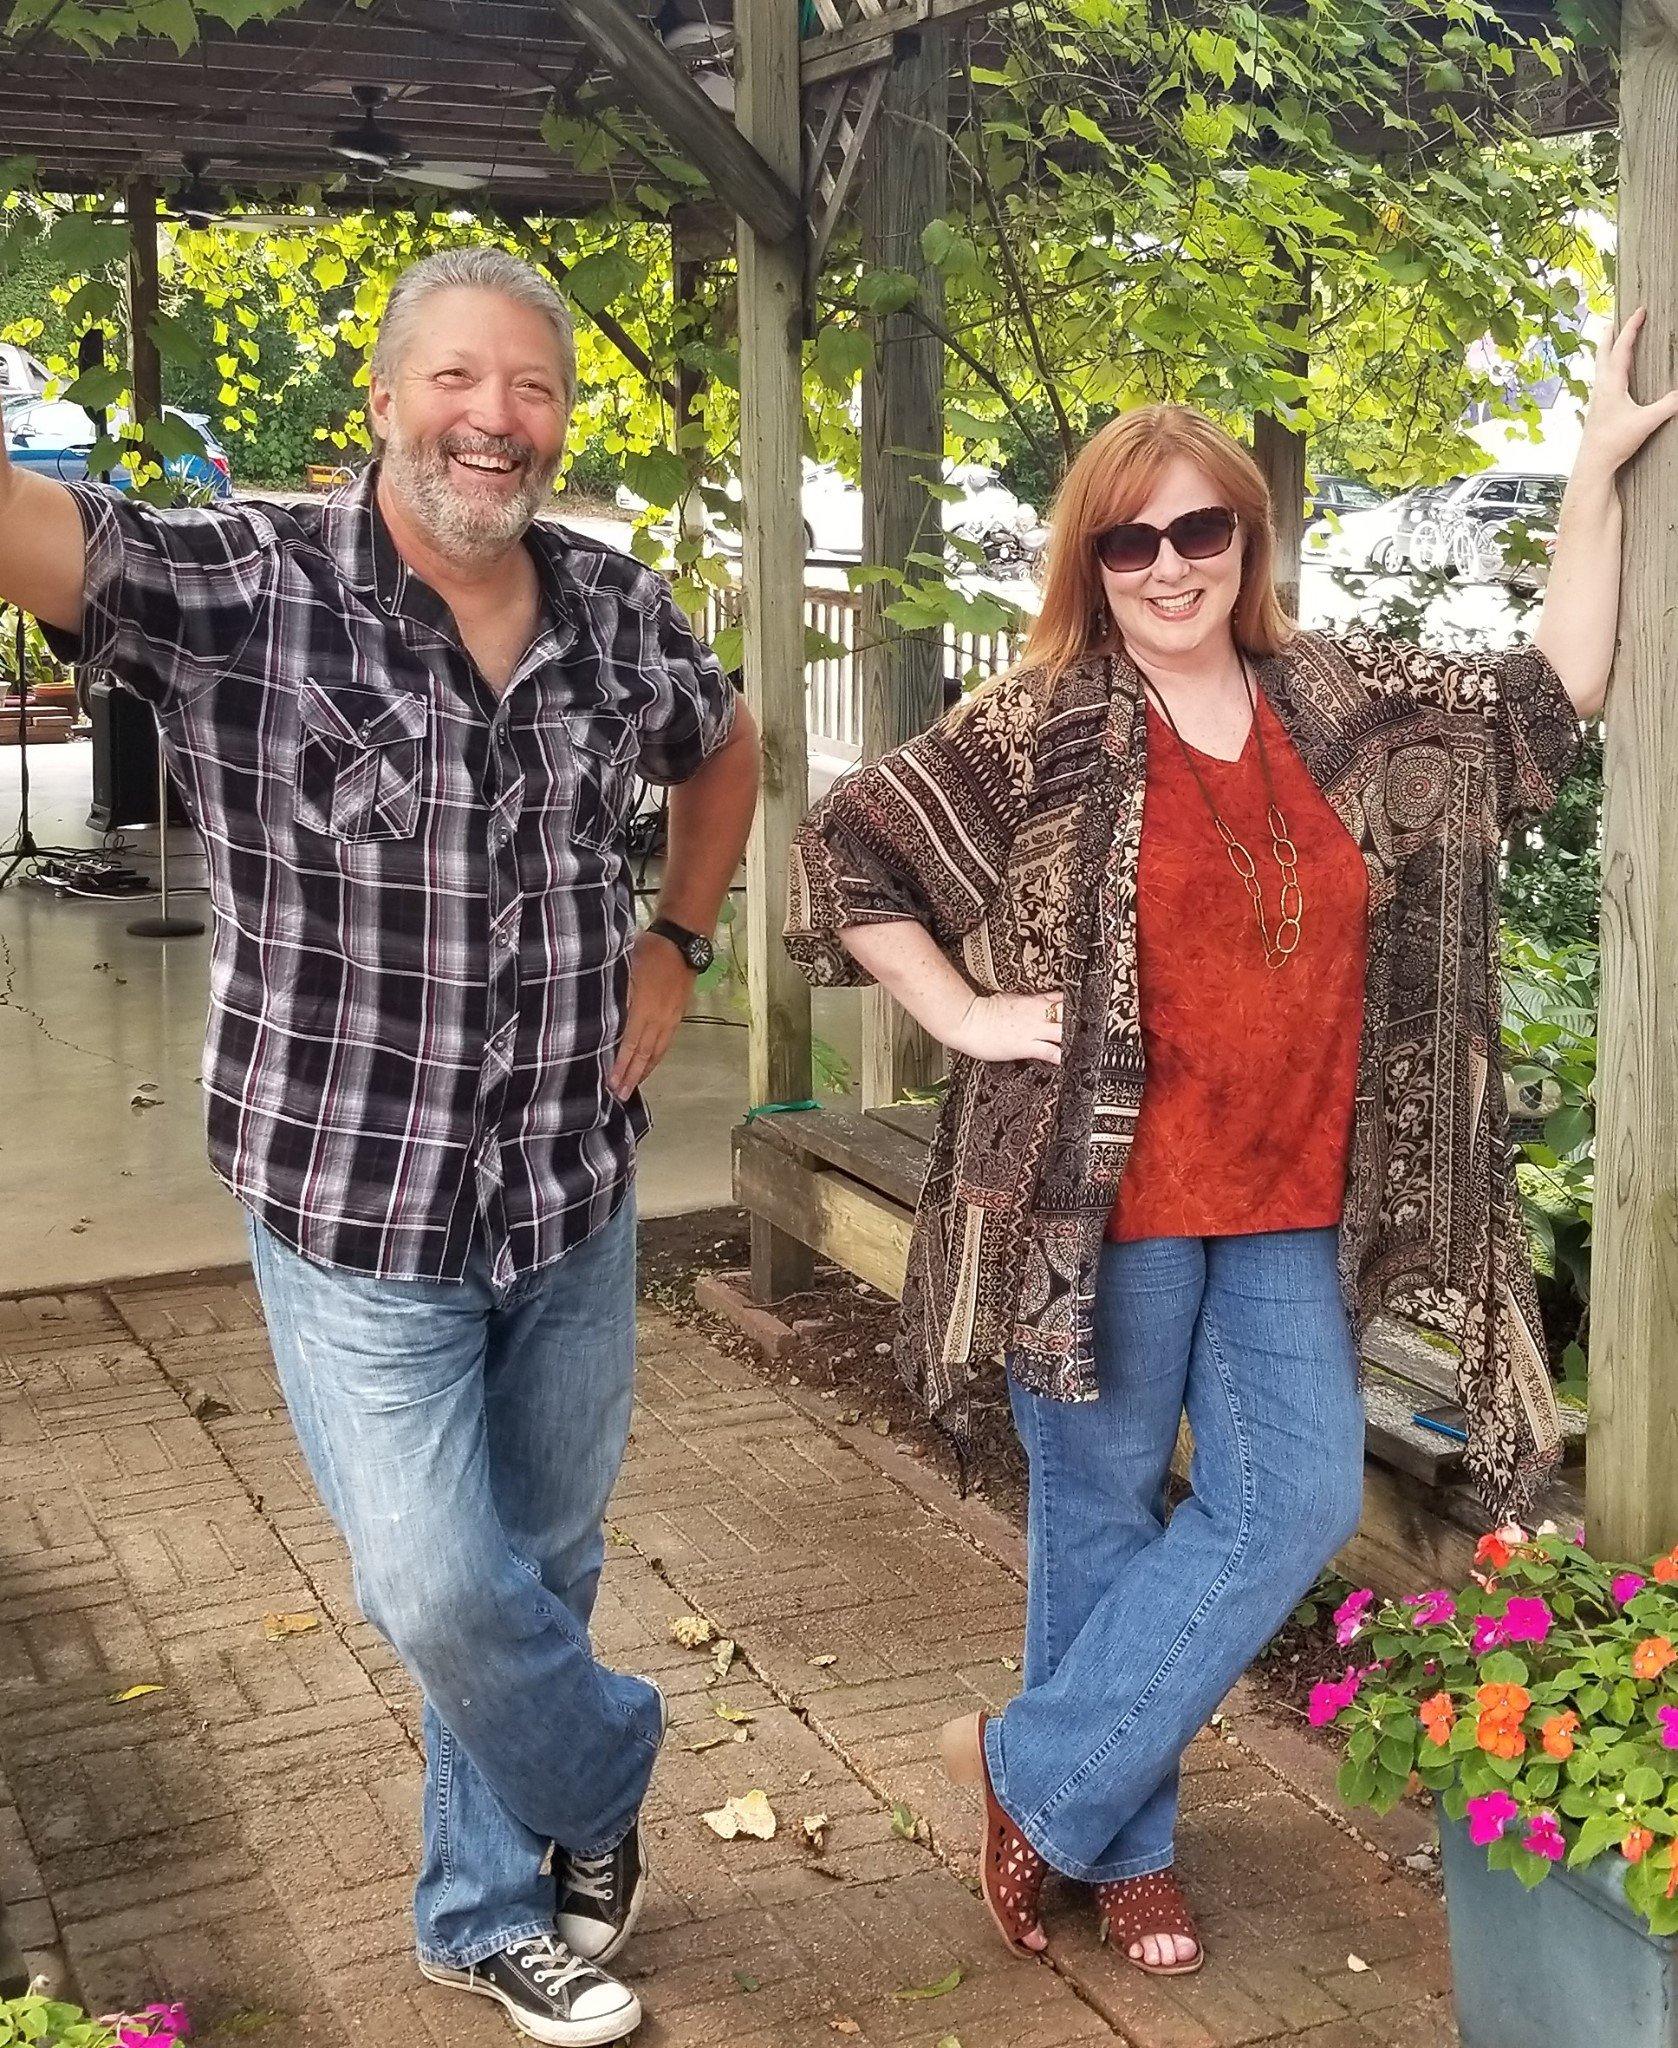 Pam and Jeff at Blumenhof Winery